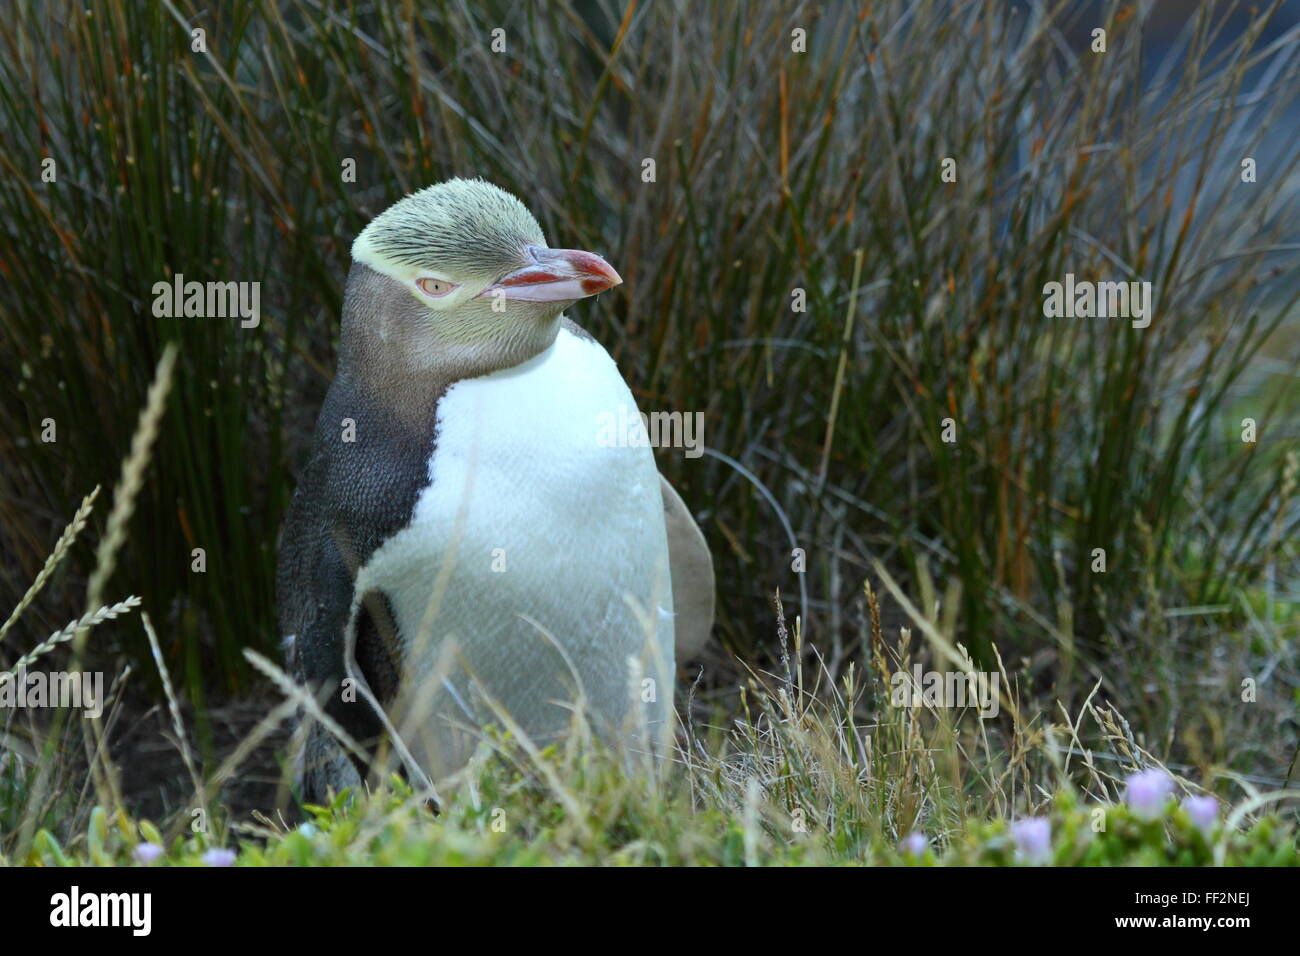 The endangered Yellow-eyed Penguin (Megadyptes antipodes) at Katiki Point Lighthouse (Moeraki Lighthouse), Moeraki, - Stock Image